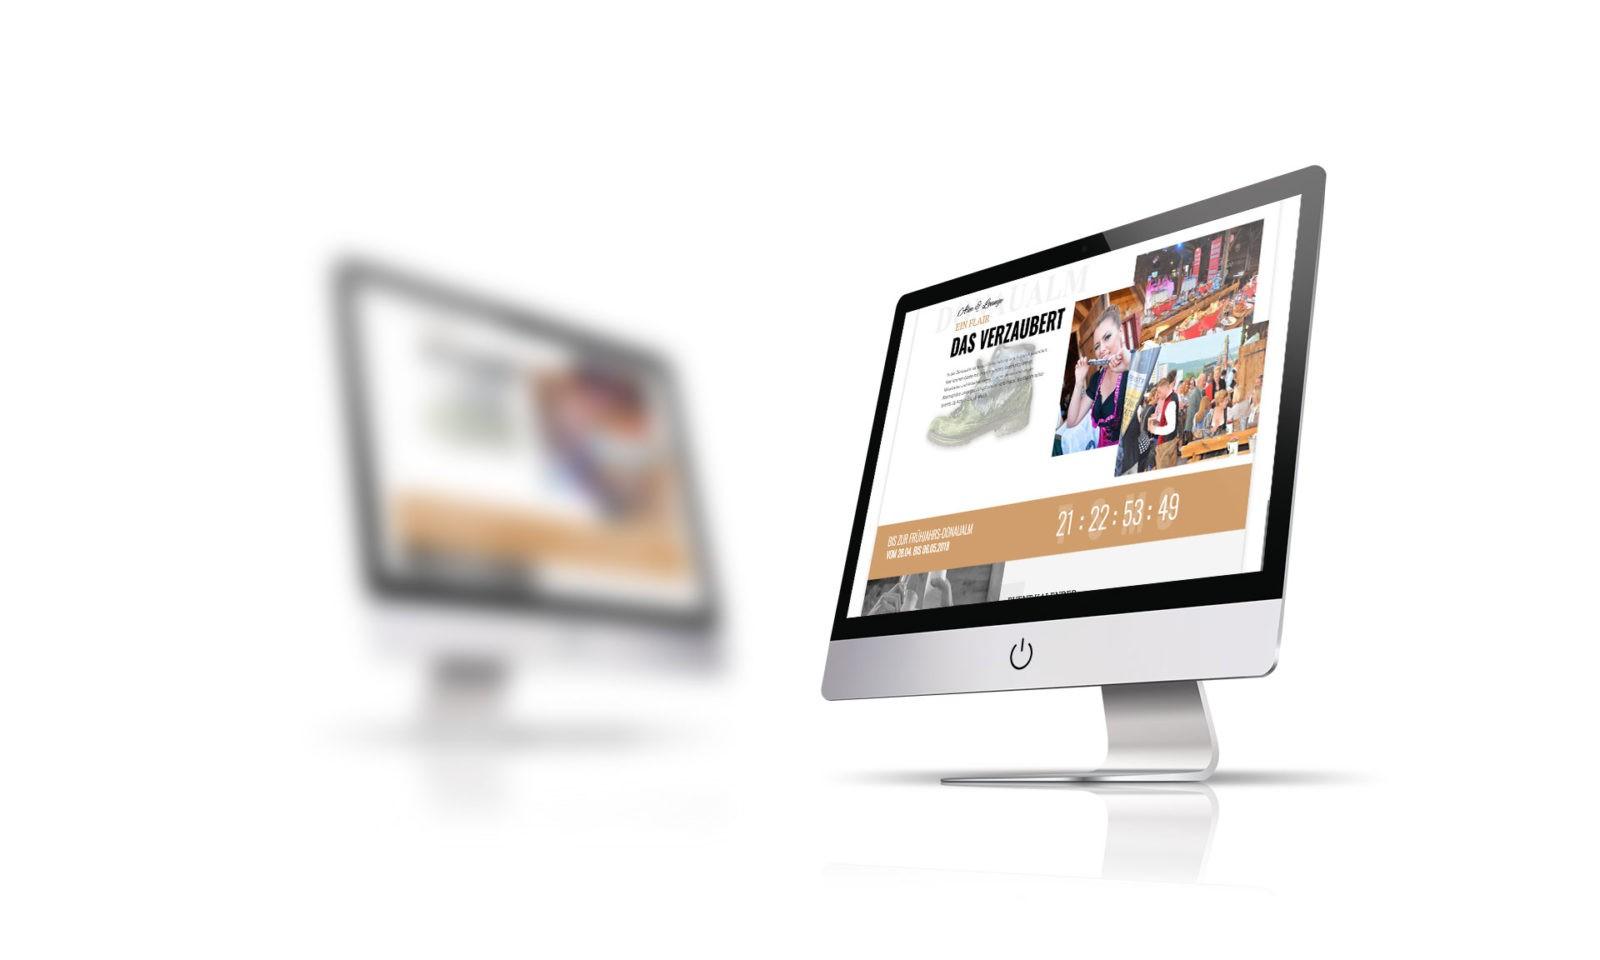 Donaualm Linz - responsive Webdesign - Neugestaltung